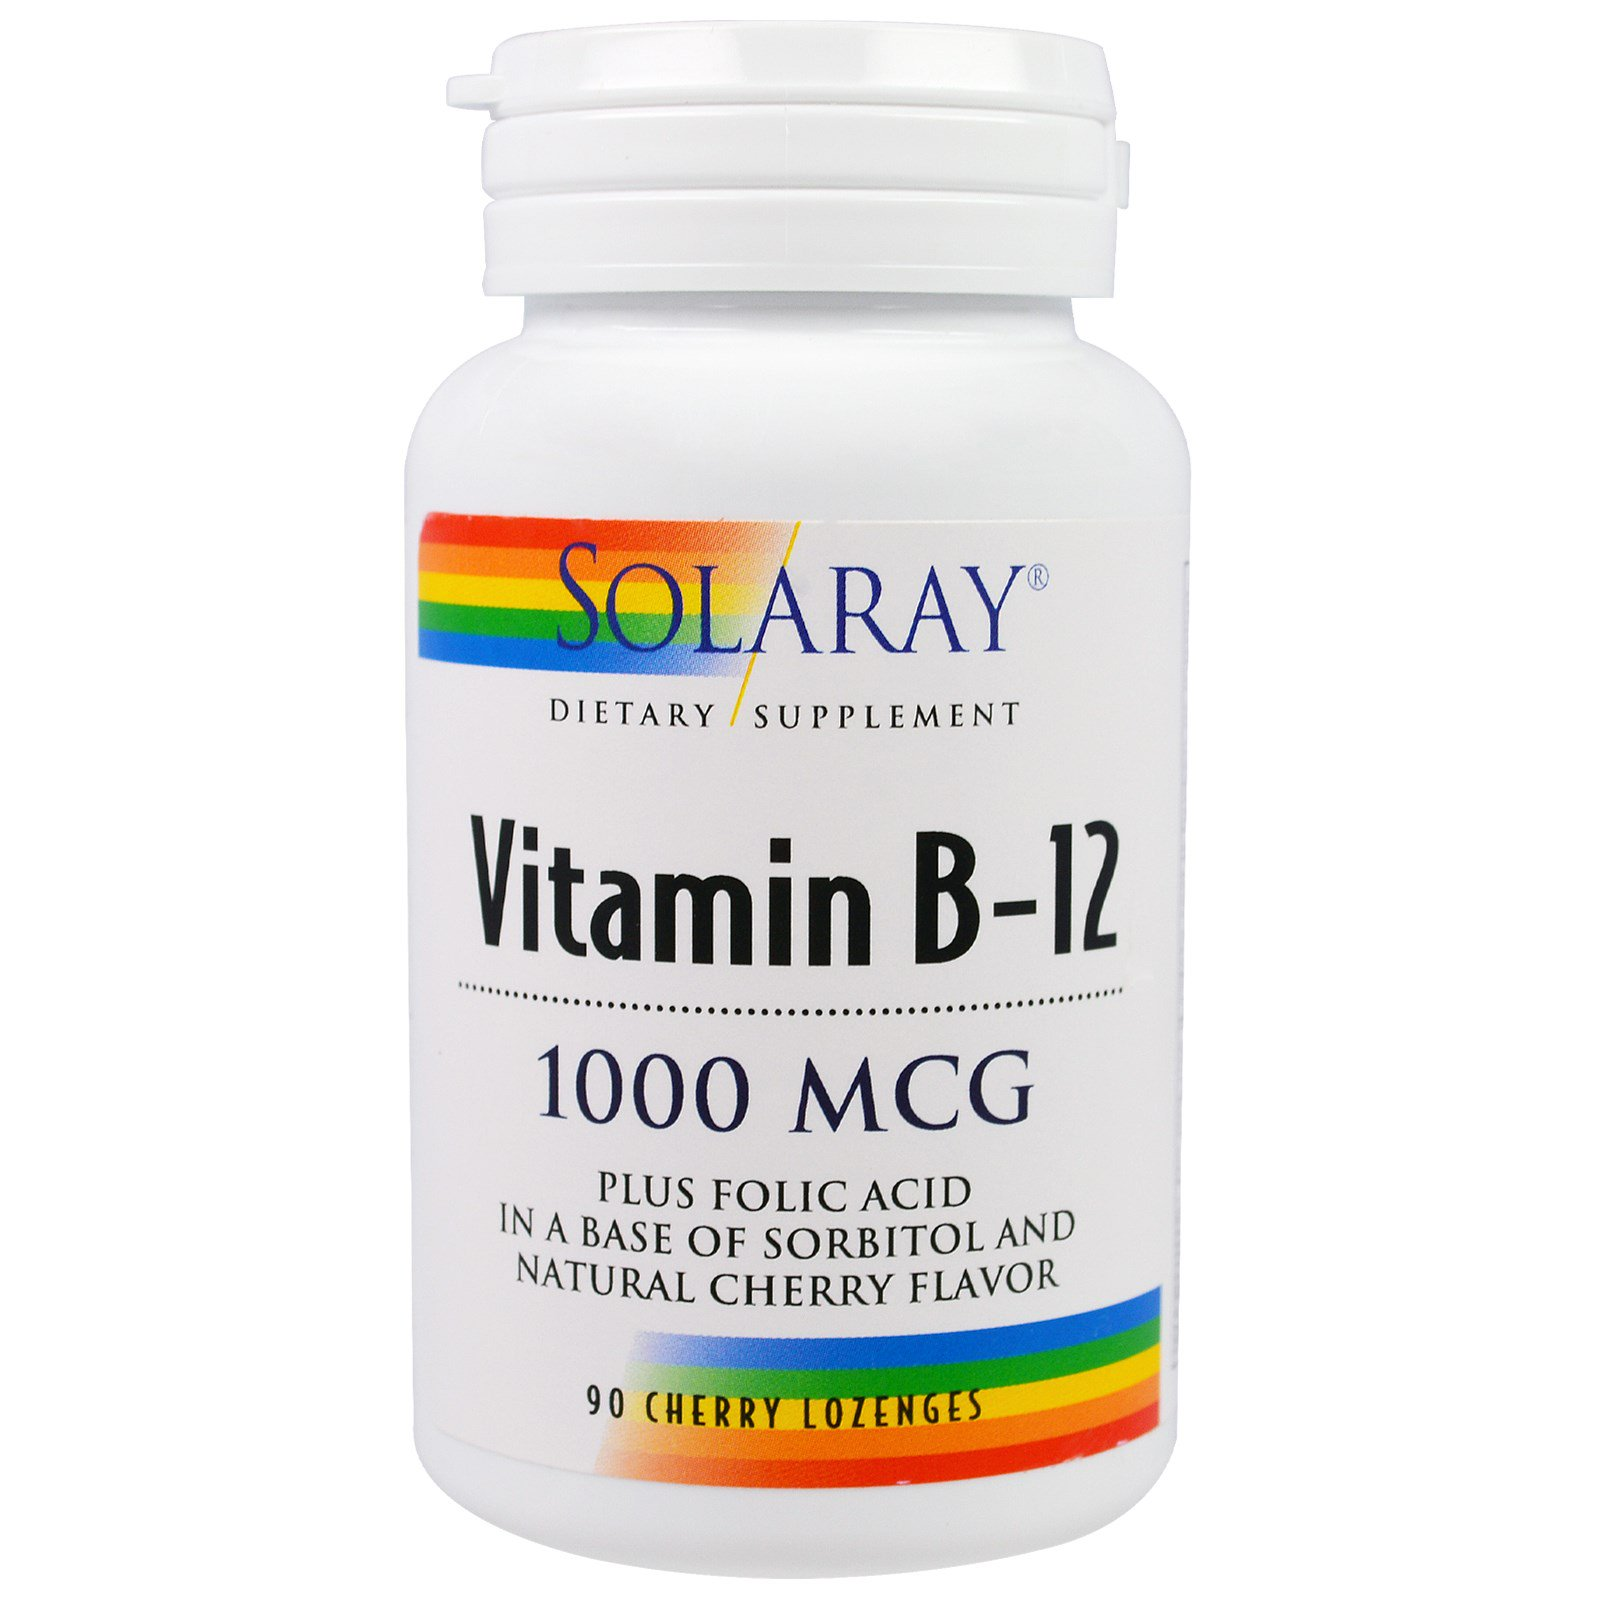 Solaray, Витамин В12, 1000 мкг, 90 вишневых пастилок